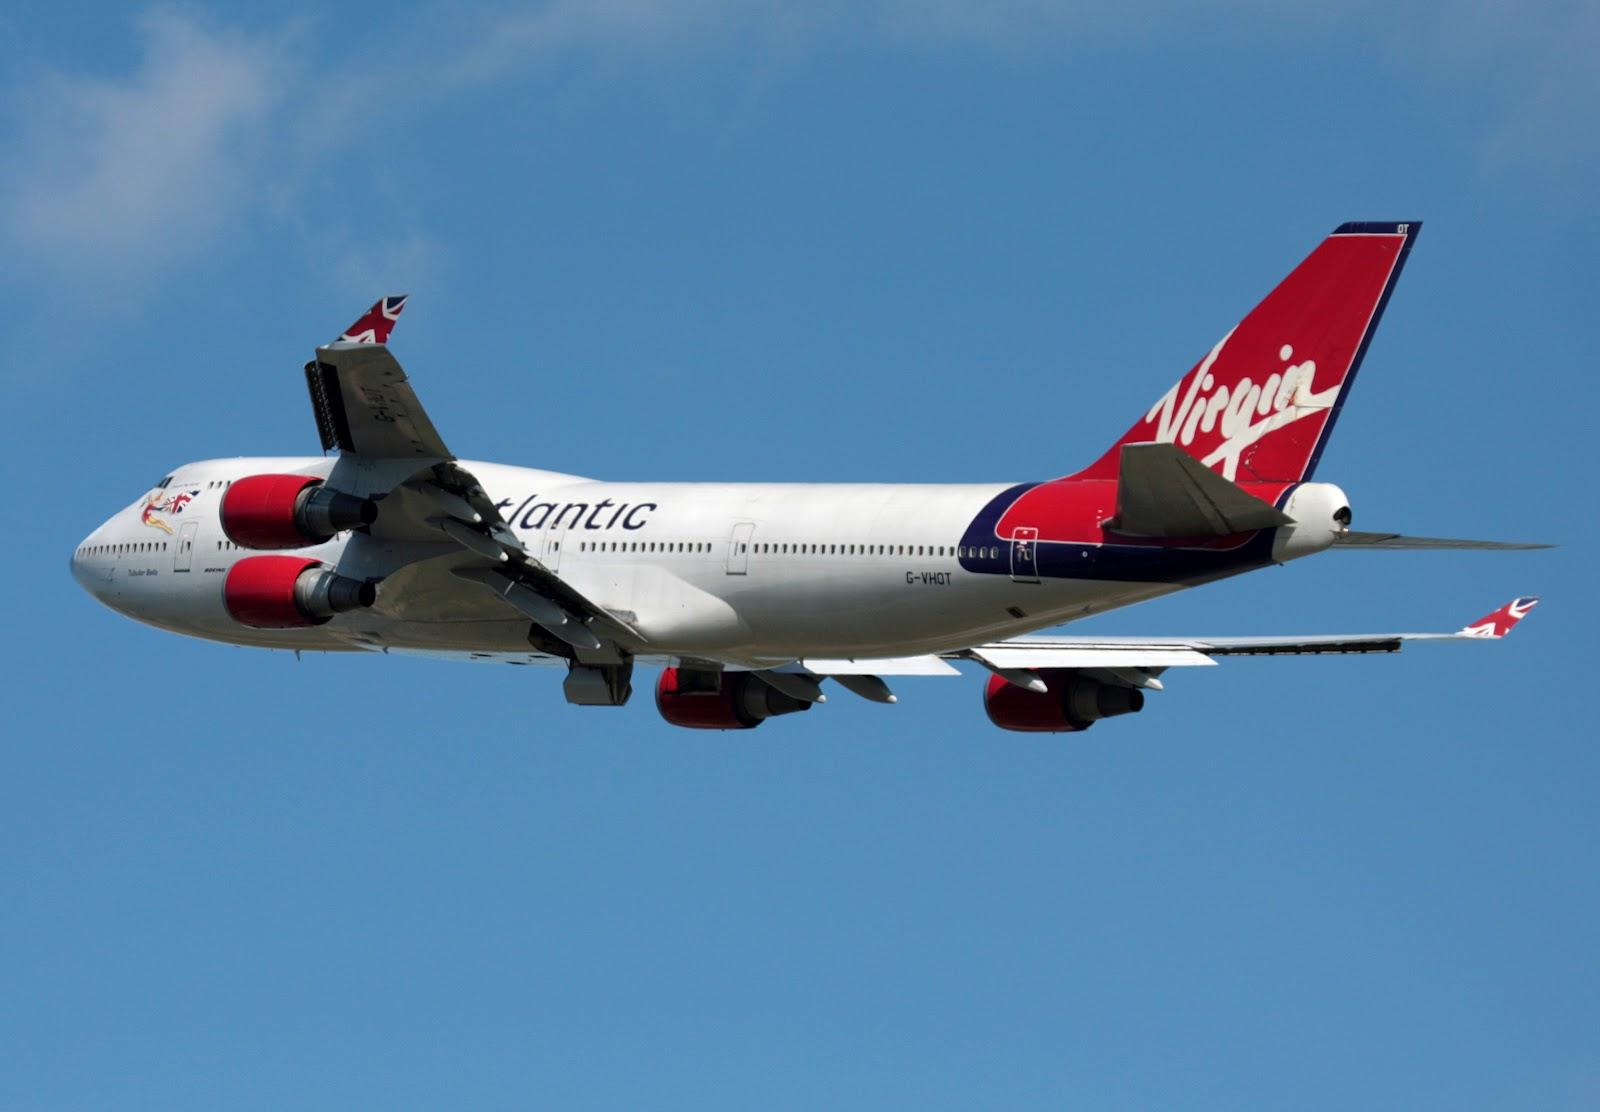 http://3.bp.blogspot.com/-wmr2pr6A6SM/T4pG4wjNXGI/AAAAAAAAH5U/rsma_tVg7sU/s1600/boeing_747-400_virgin_atlantic.jpg